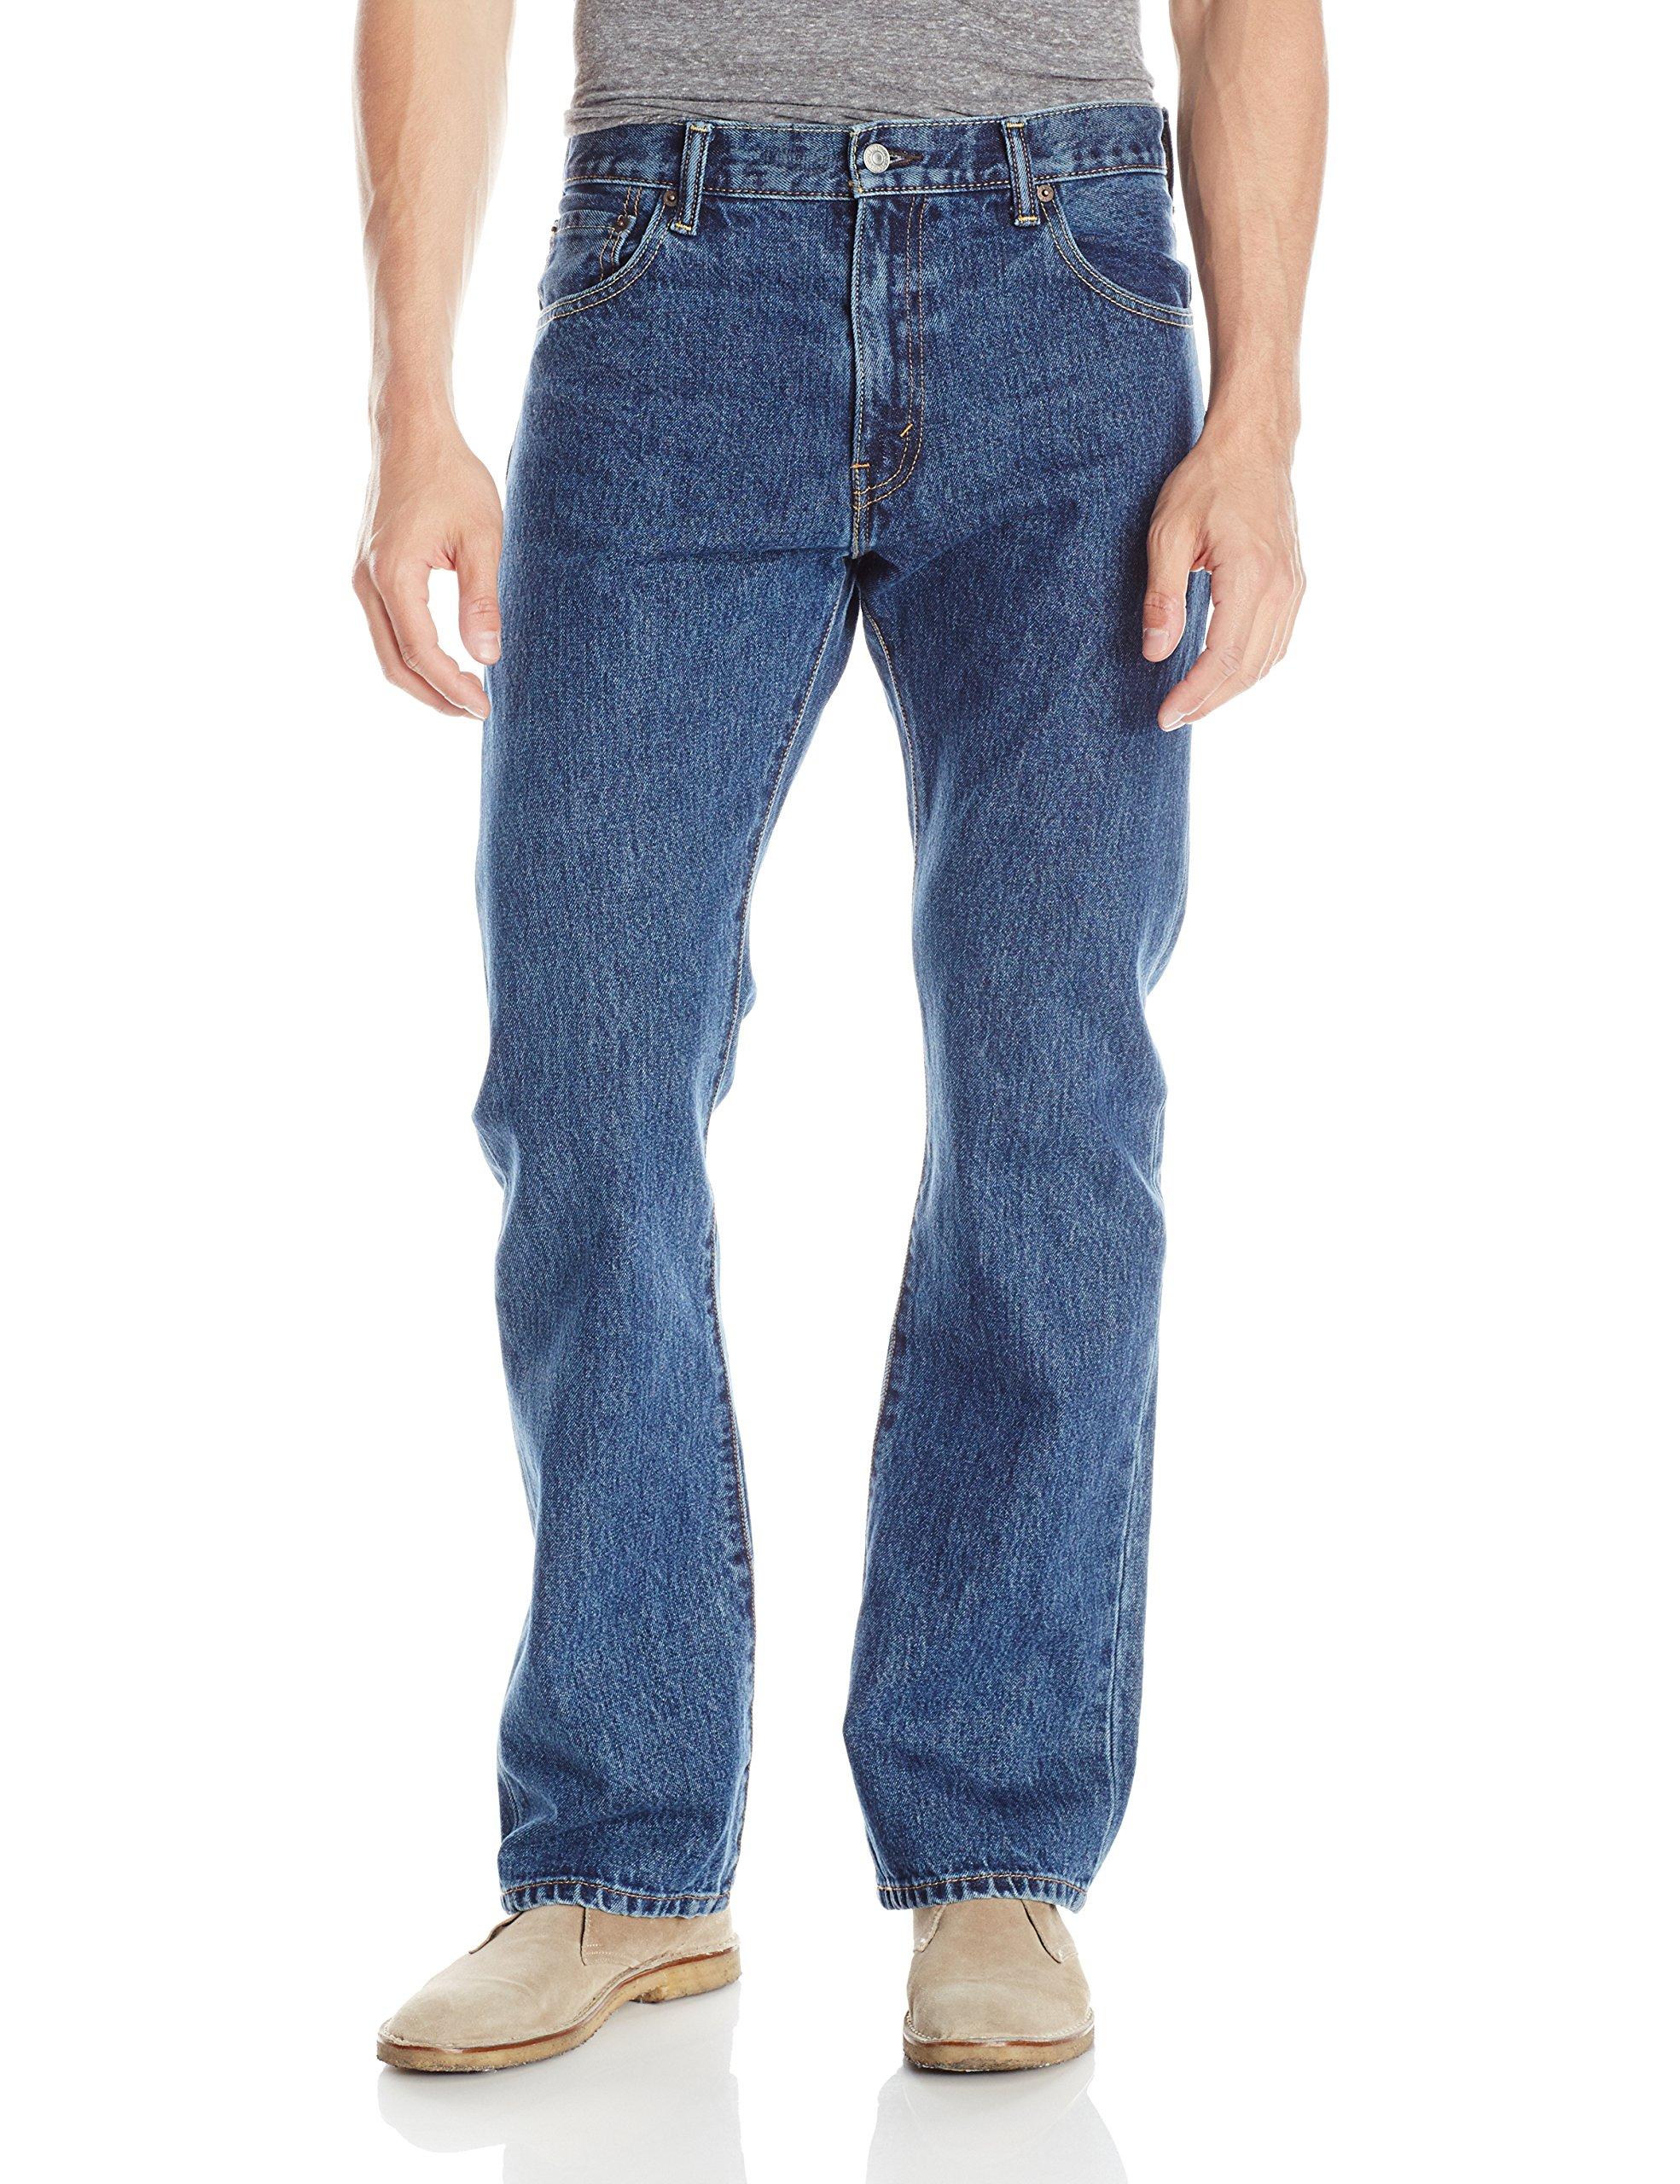 Levi's Men's 517 Boot Cut Jean, Dark Stonewash, 29x30